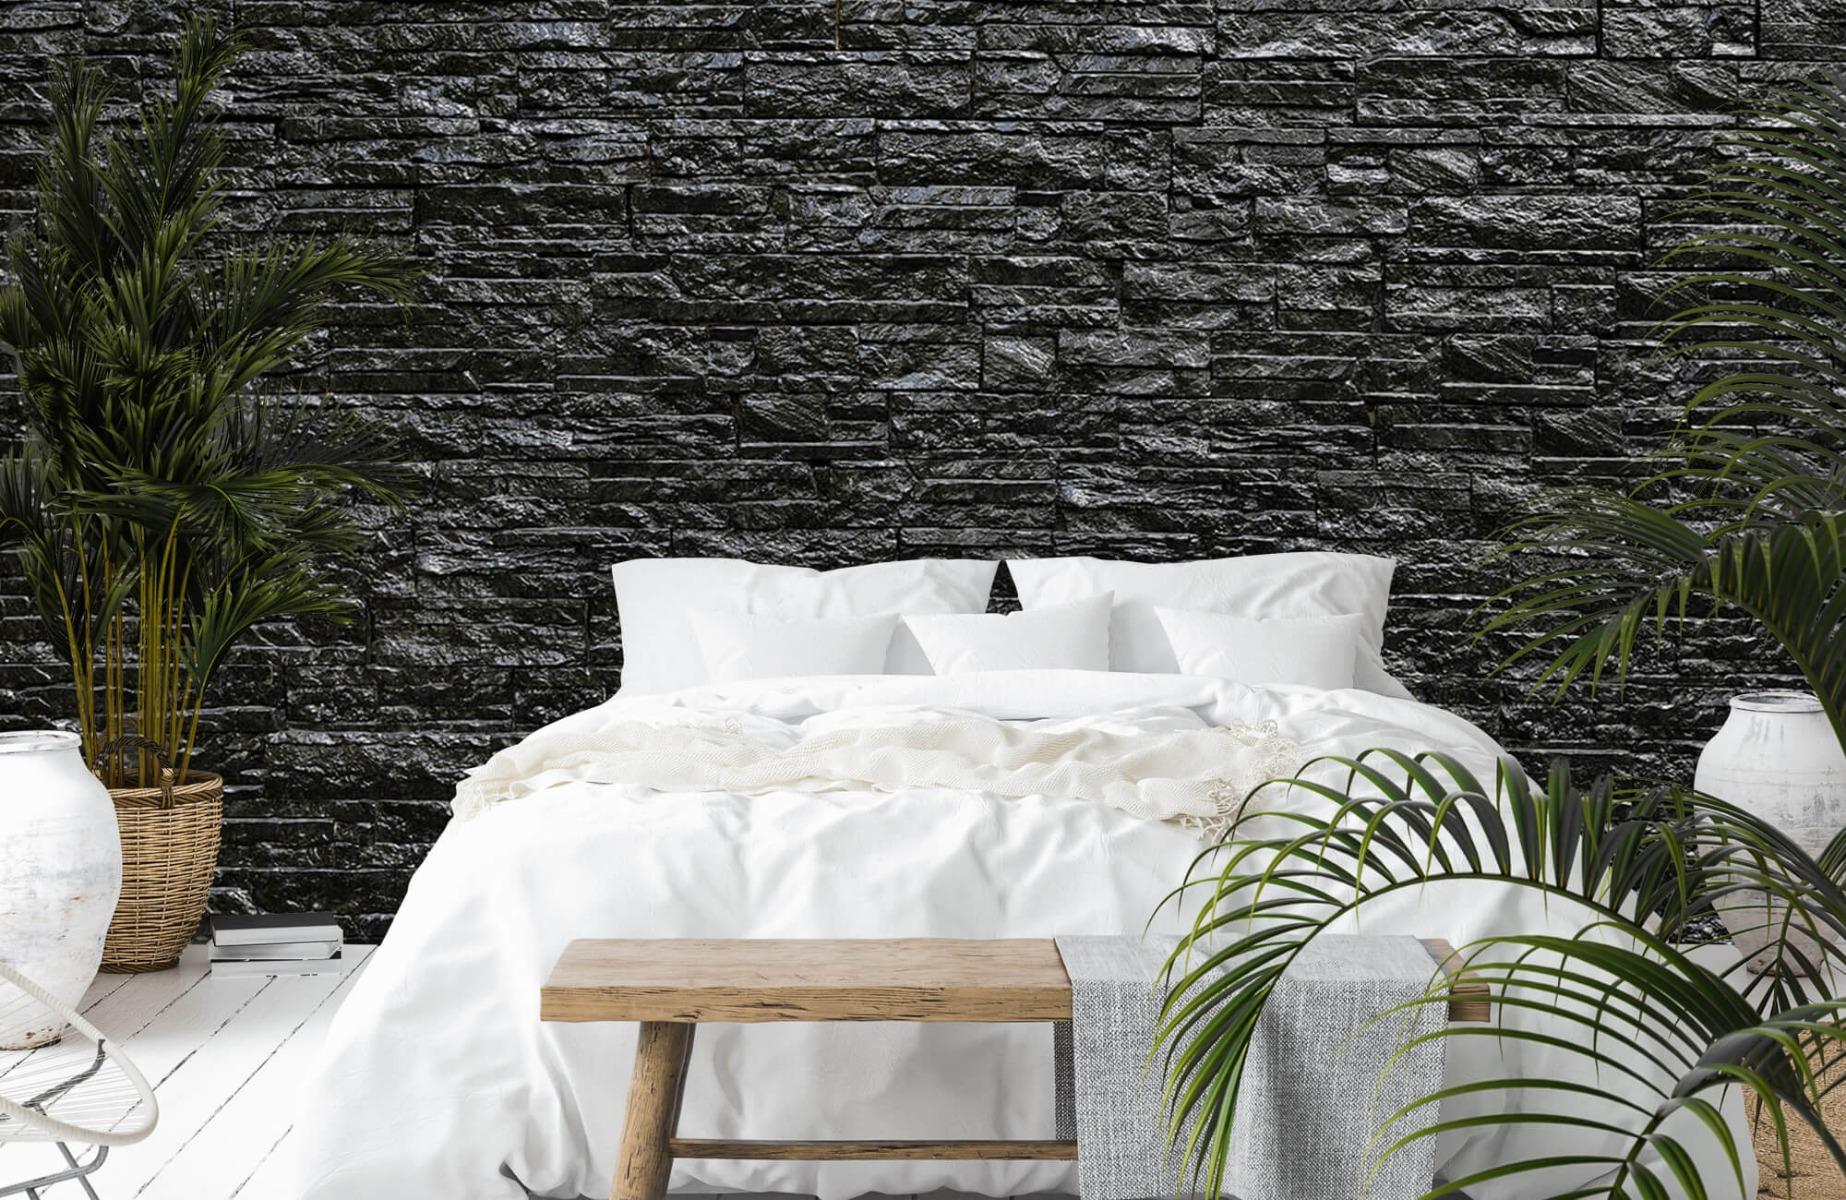 Steen behang - Zwarte stenen - Slaapkamer 13